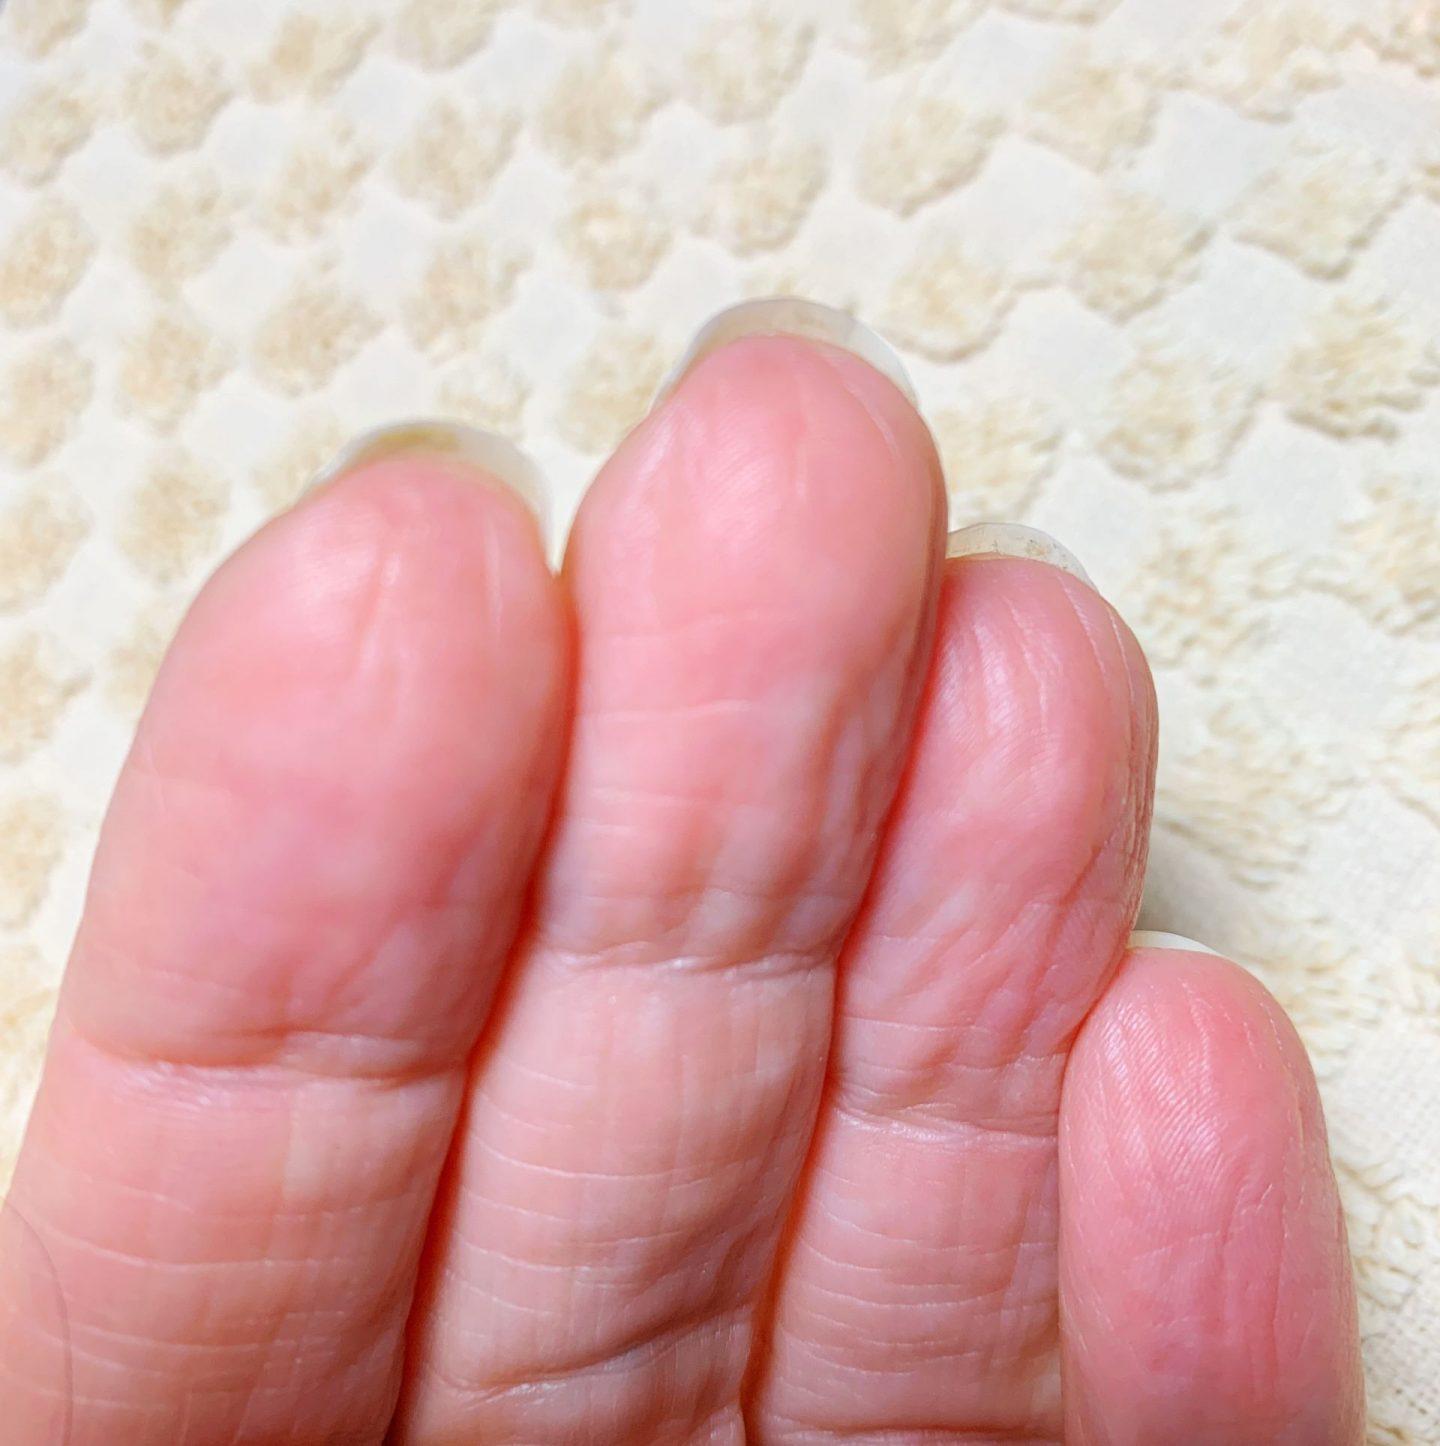 What hides behind your fingernails?